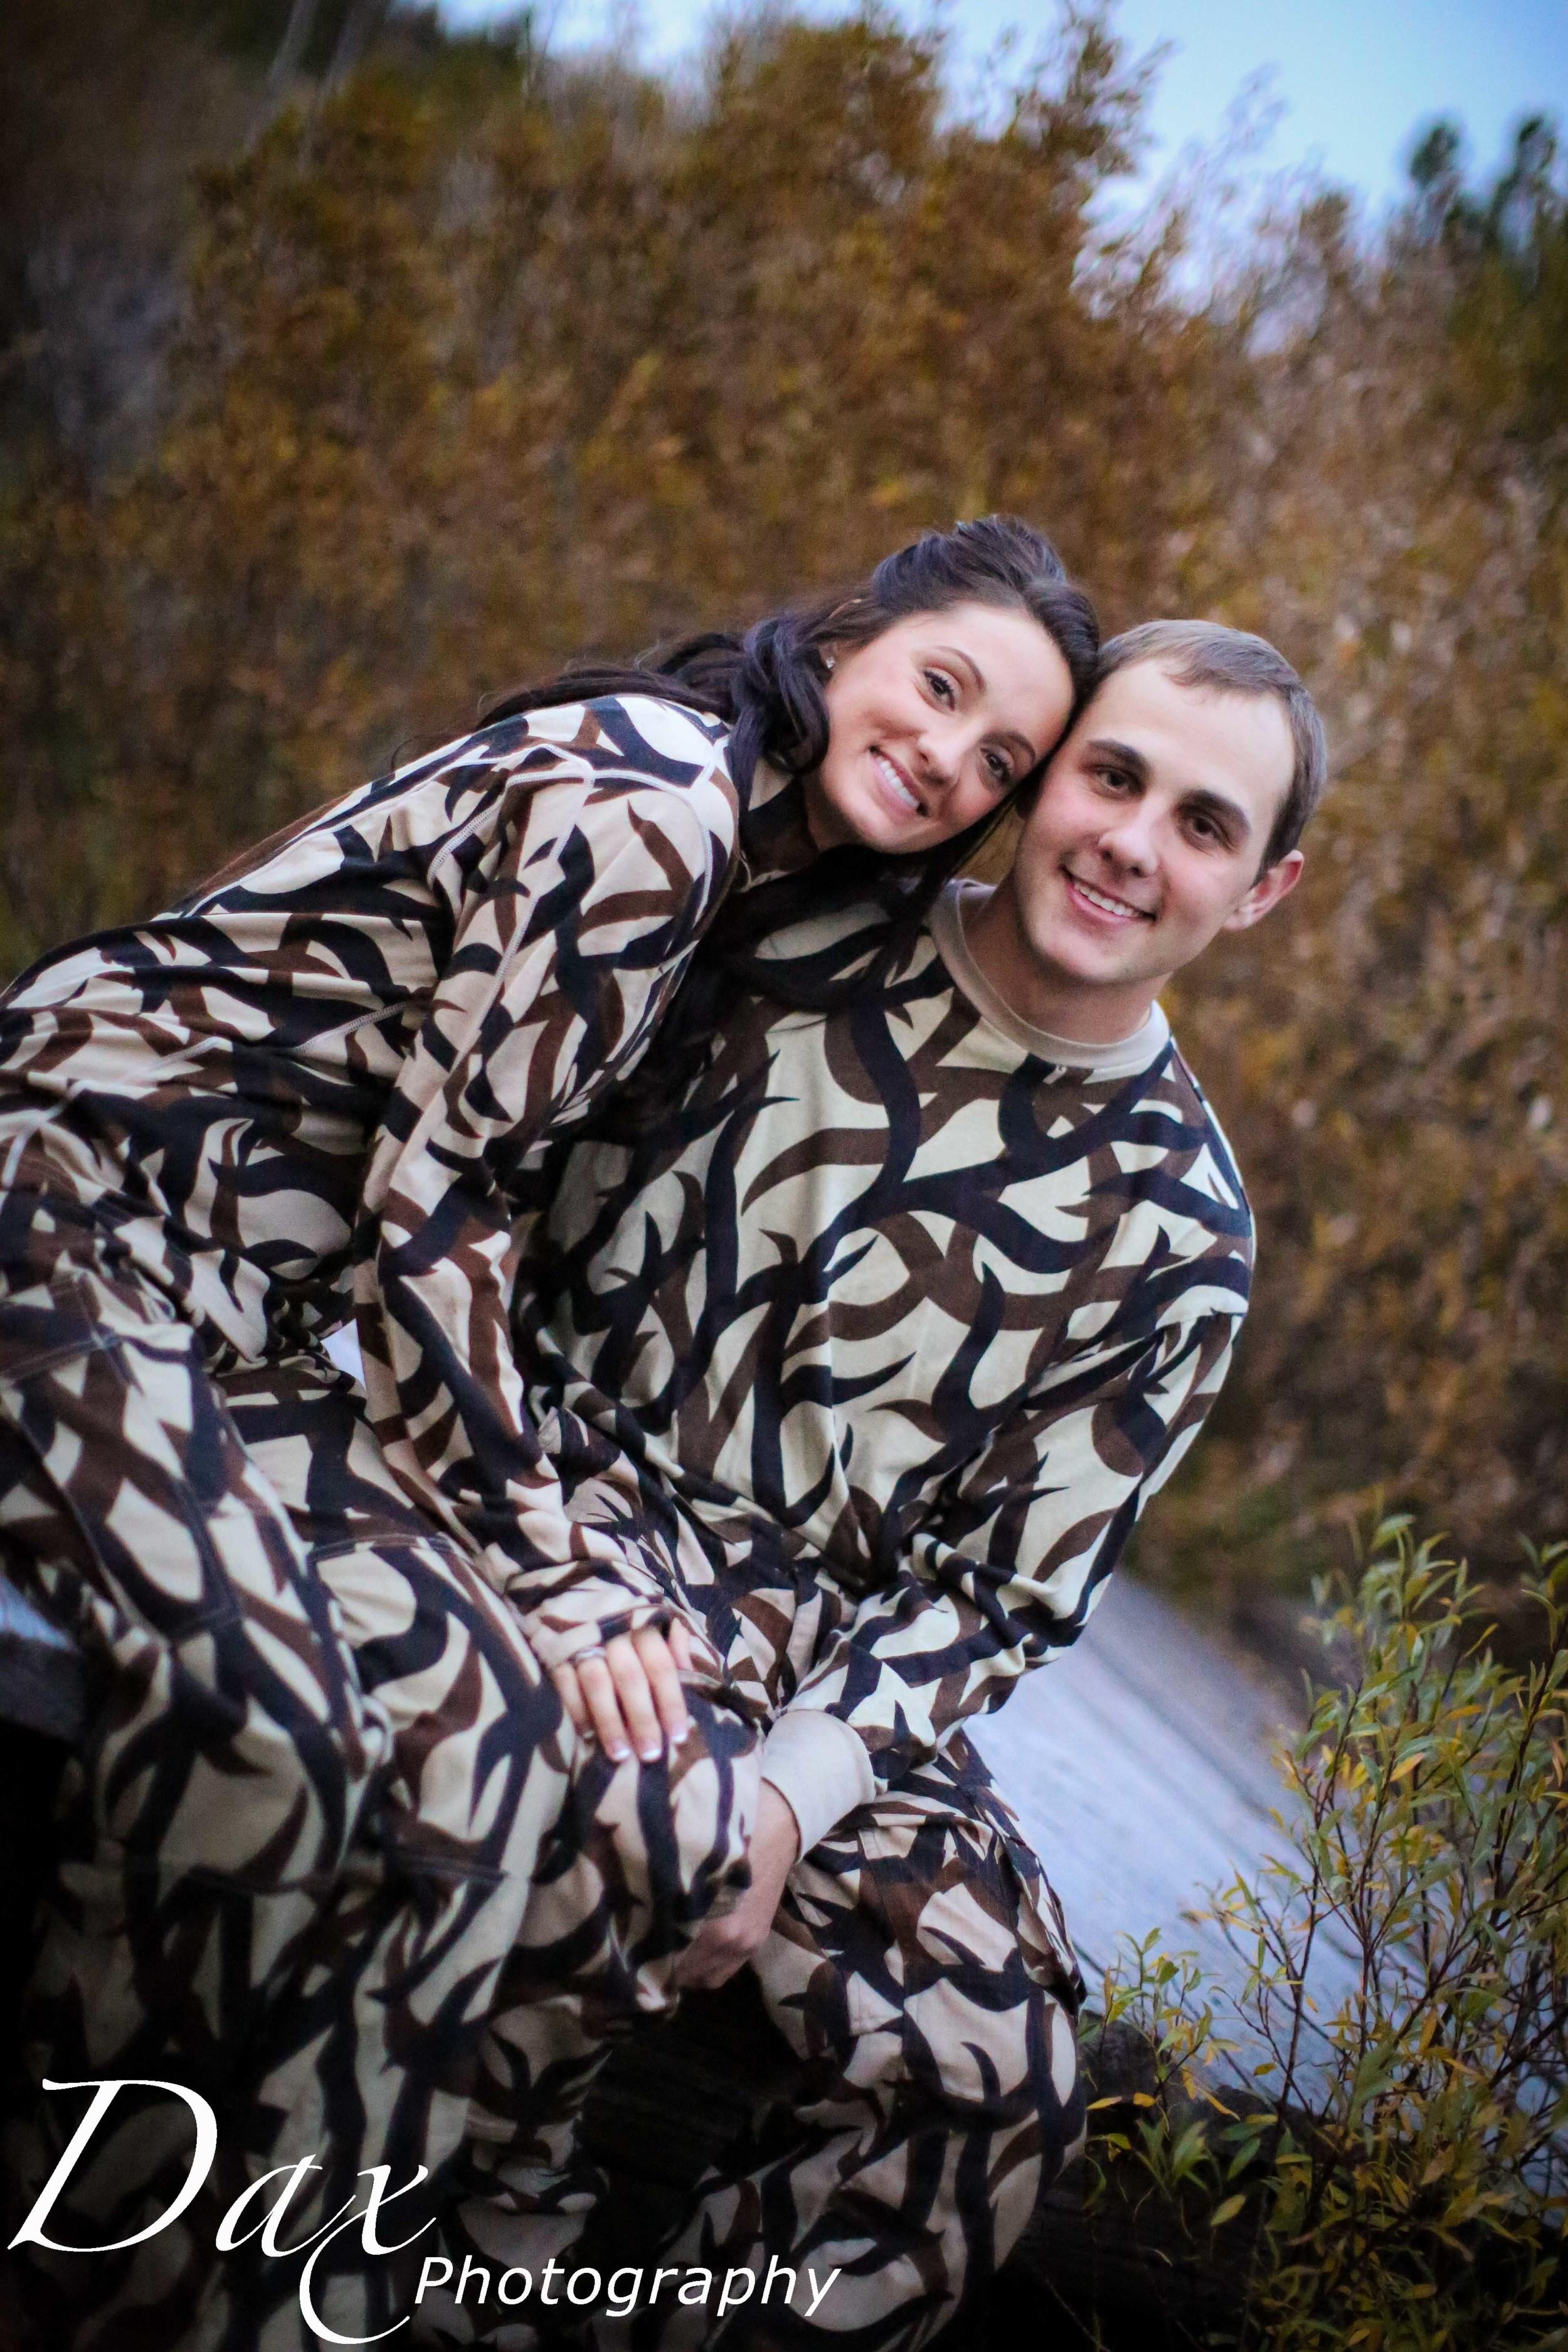 wpid-Montana-photographer-Engagement-Portrait-57831.jpg